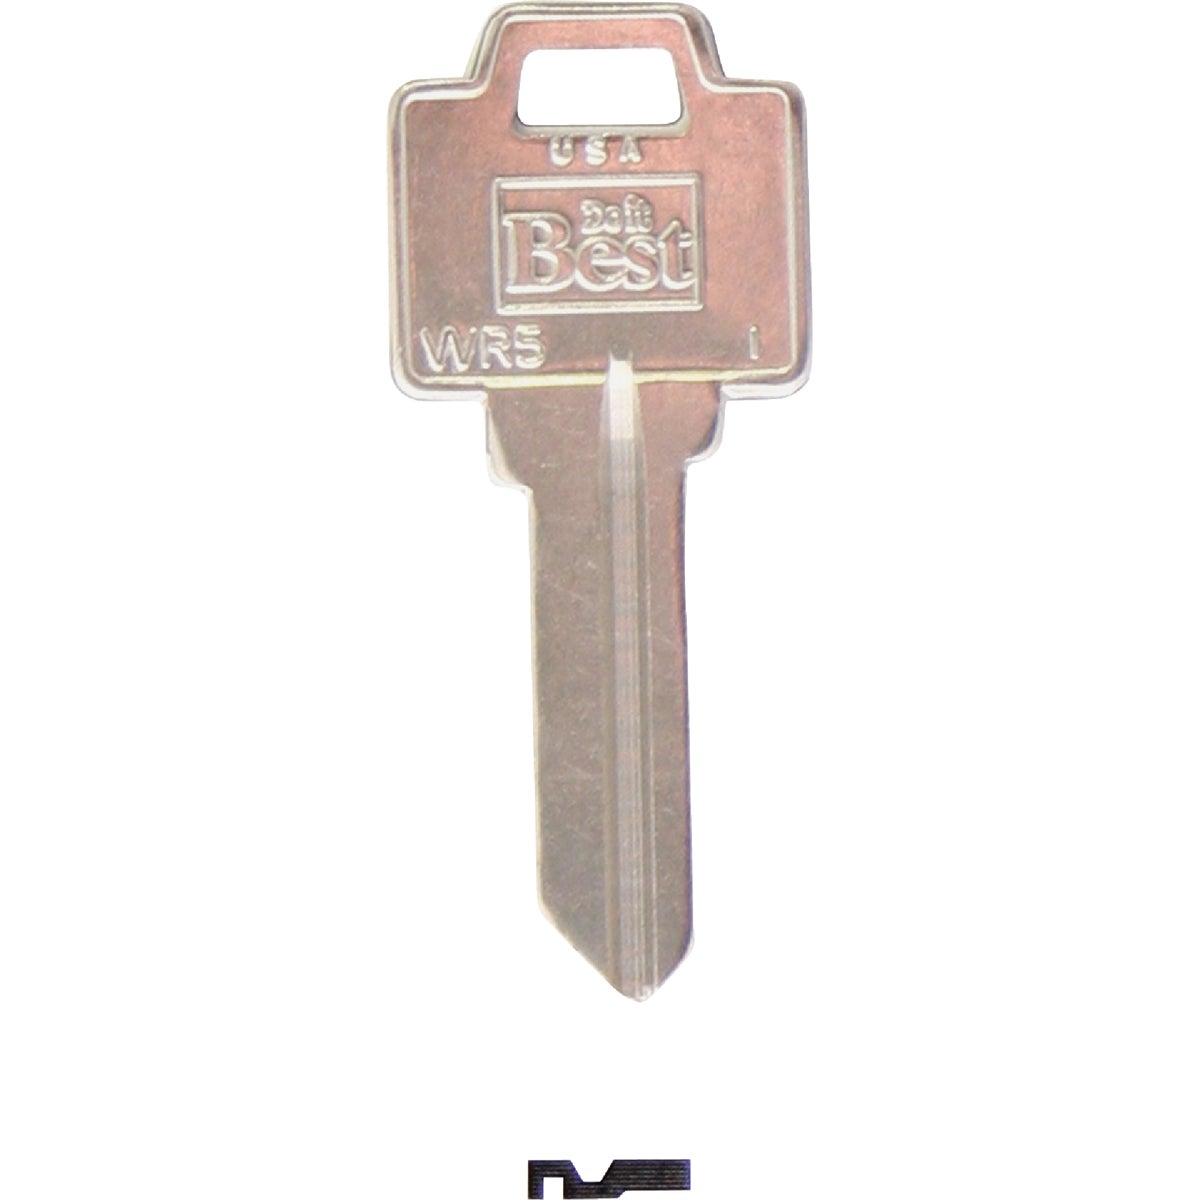 WR5 DIB WEISER DOOR KEY - N1054WB DIB by Ilco Corp